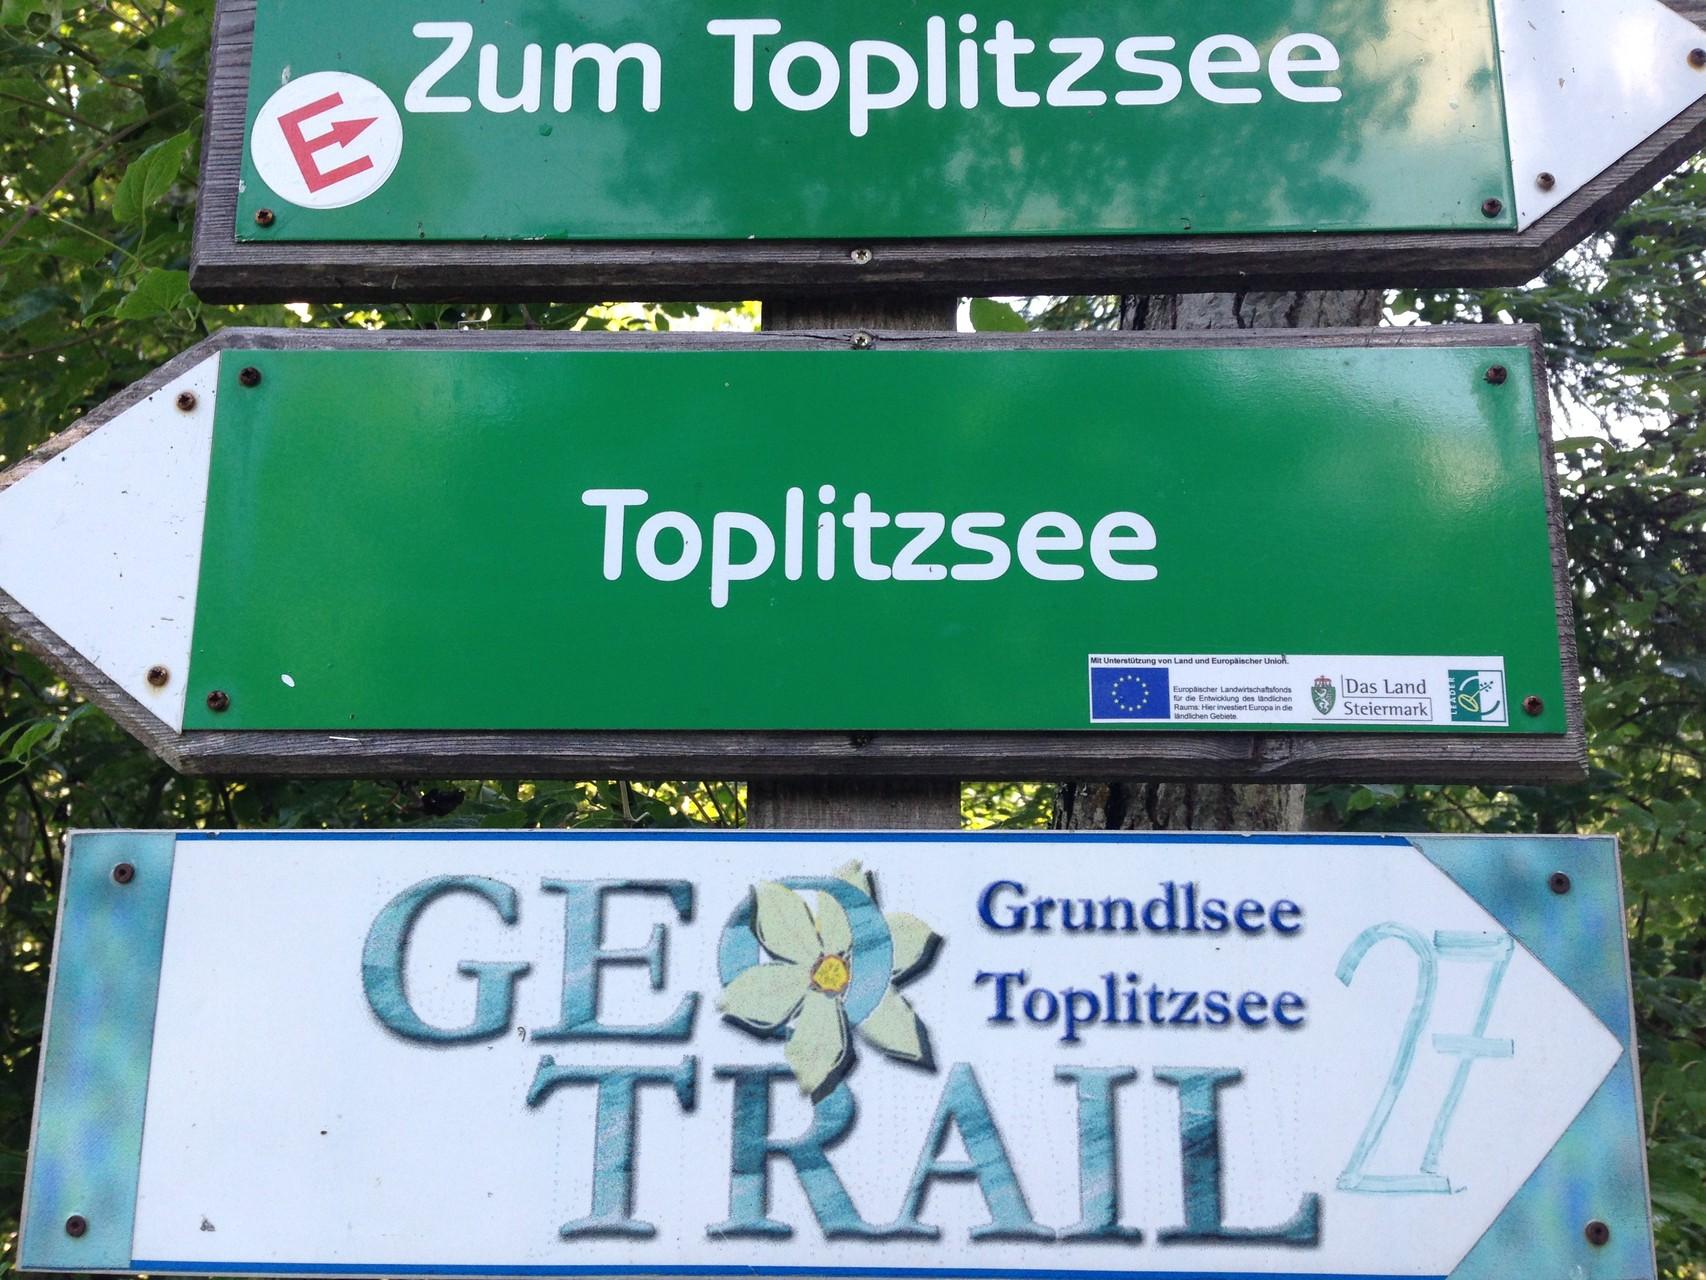 Auf dem Weg zum Toplitzsee